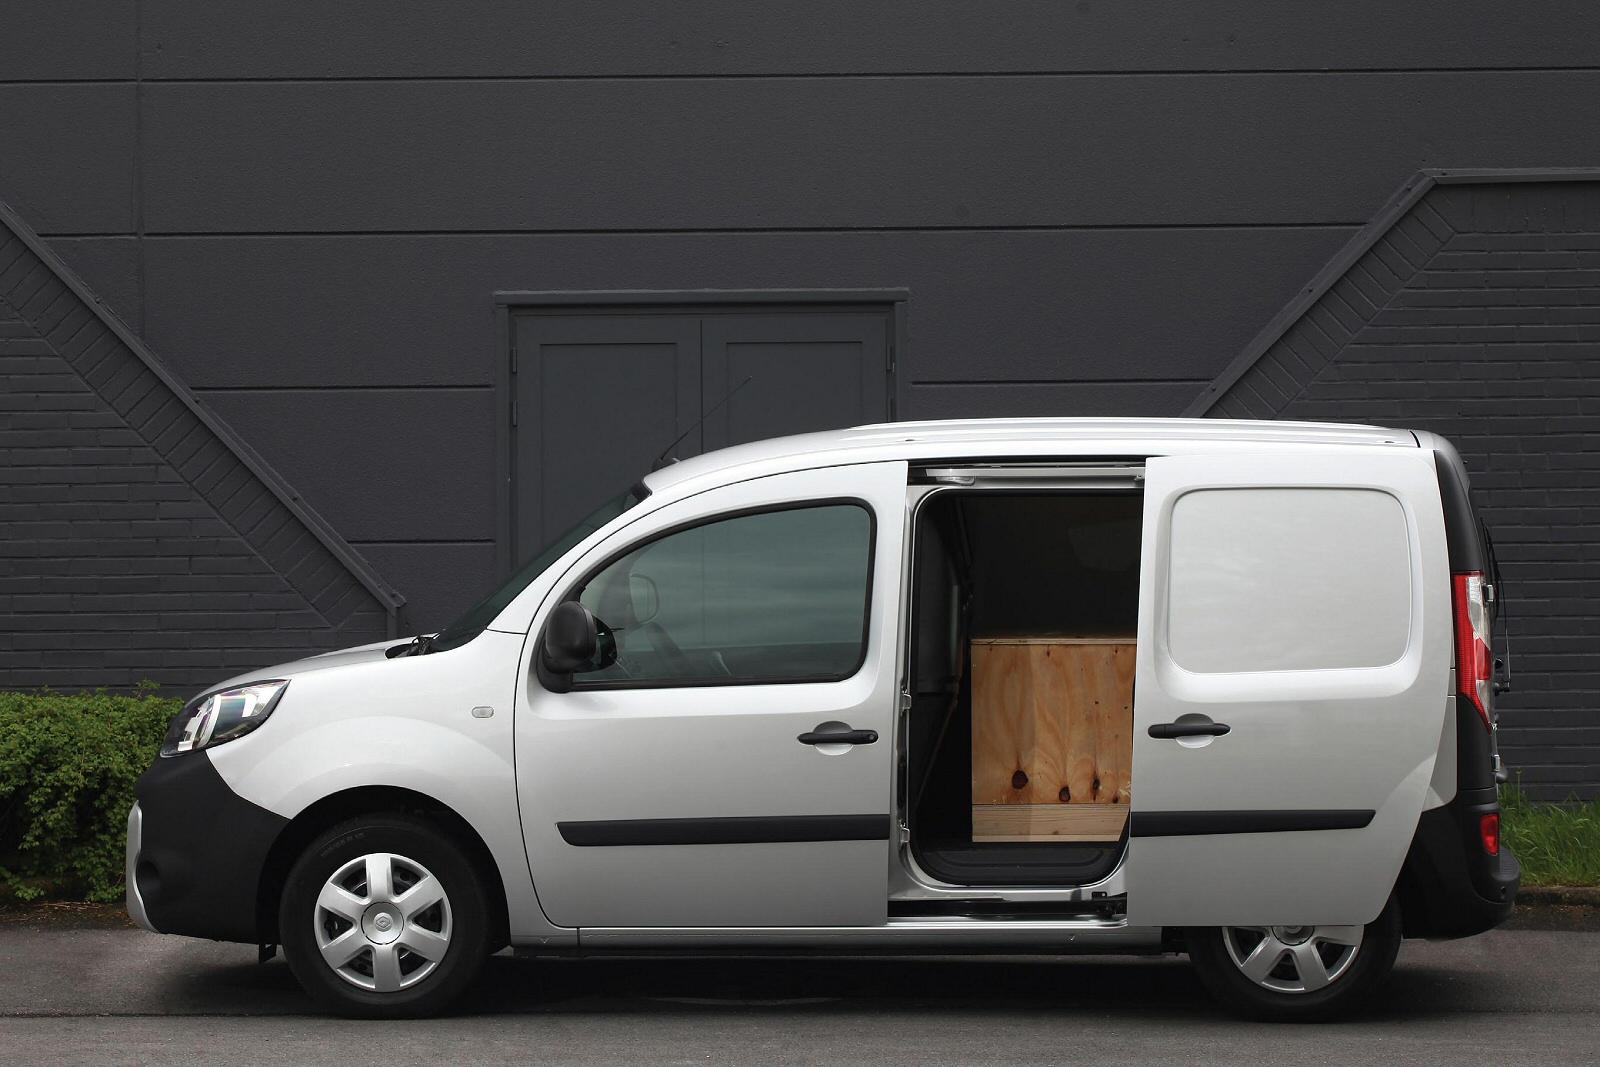 new renault kangoo diesel ml19 energy dci 110 business van euro 6 for sale bristol street. Black Bedroom Furniture Sets. Home Design Ideas